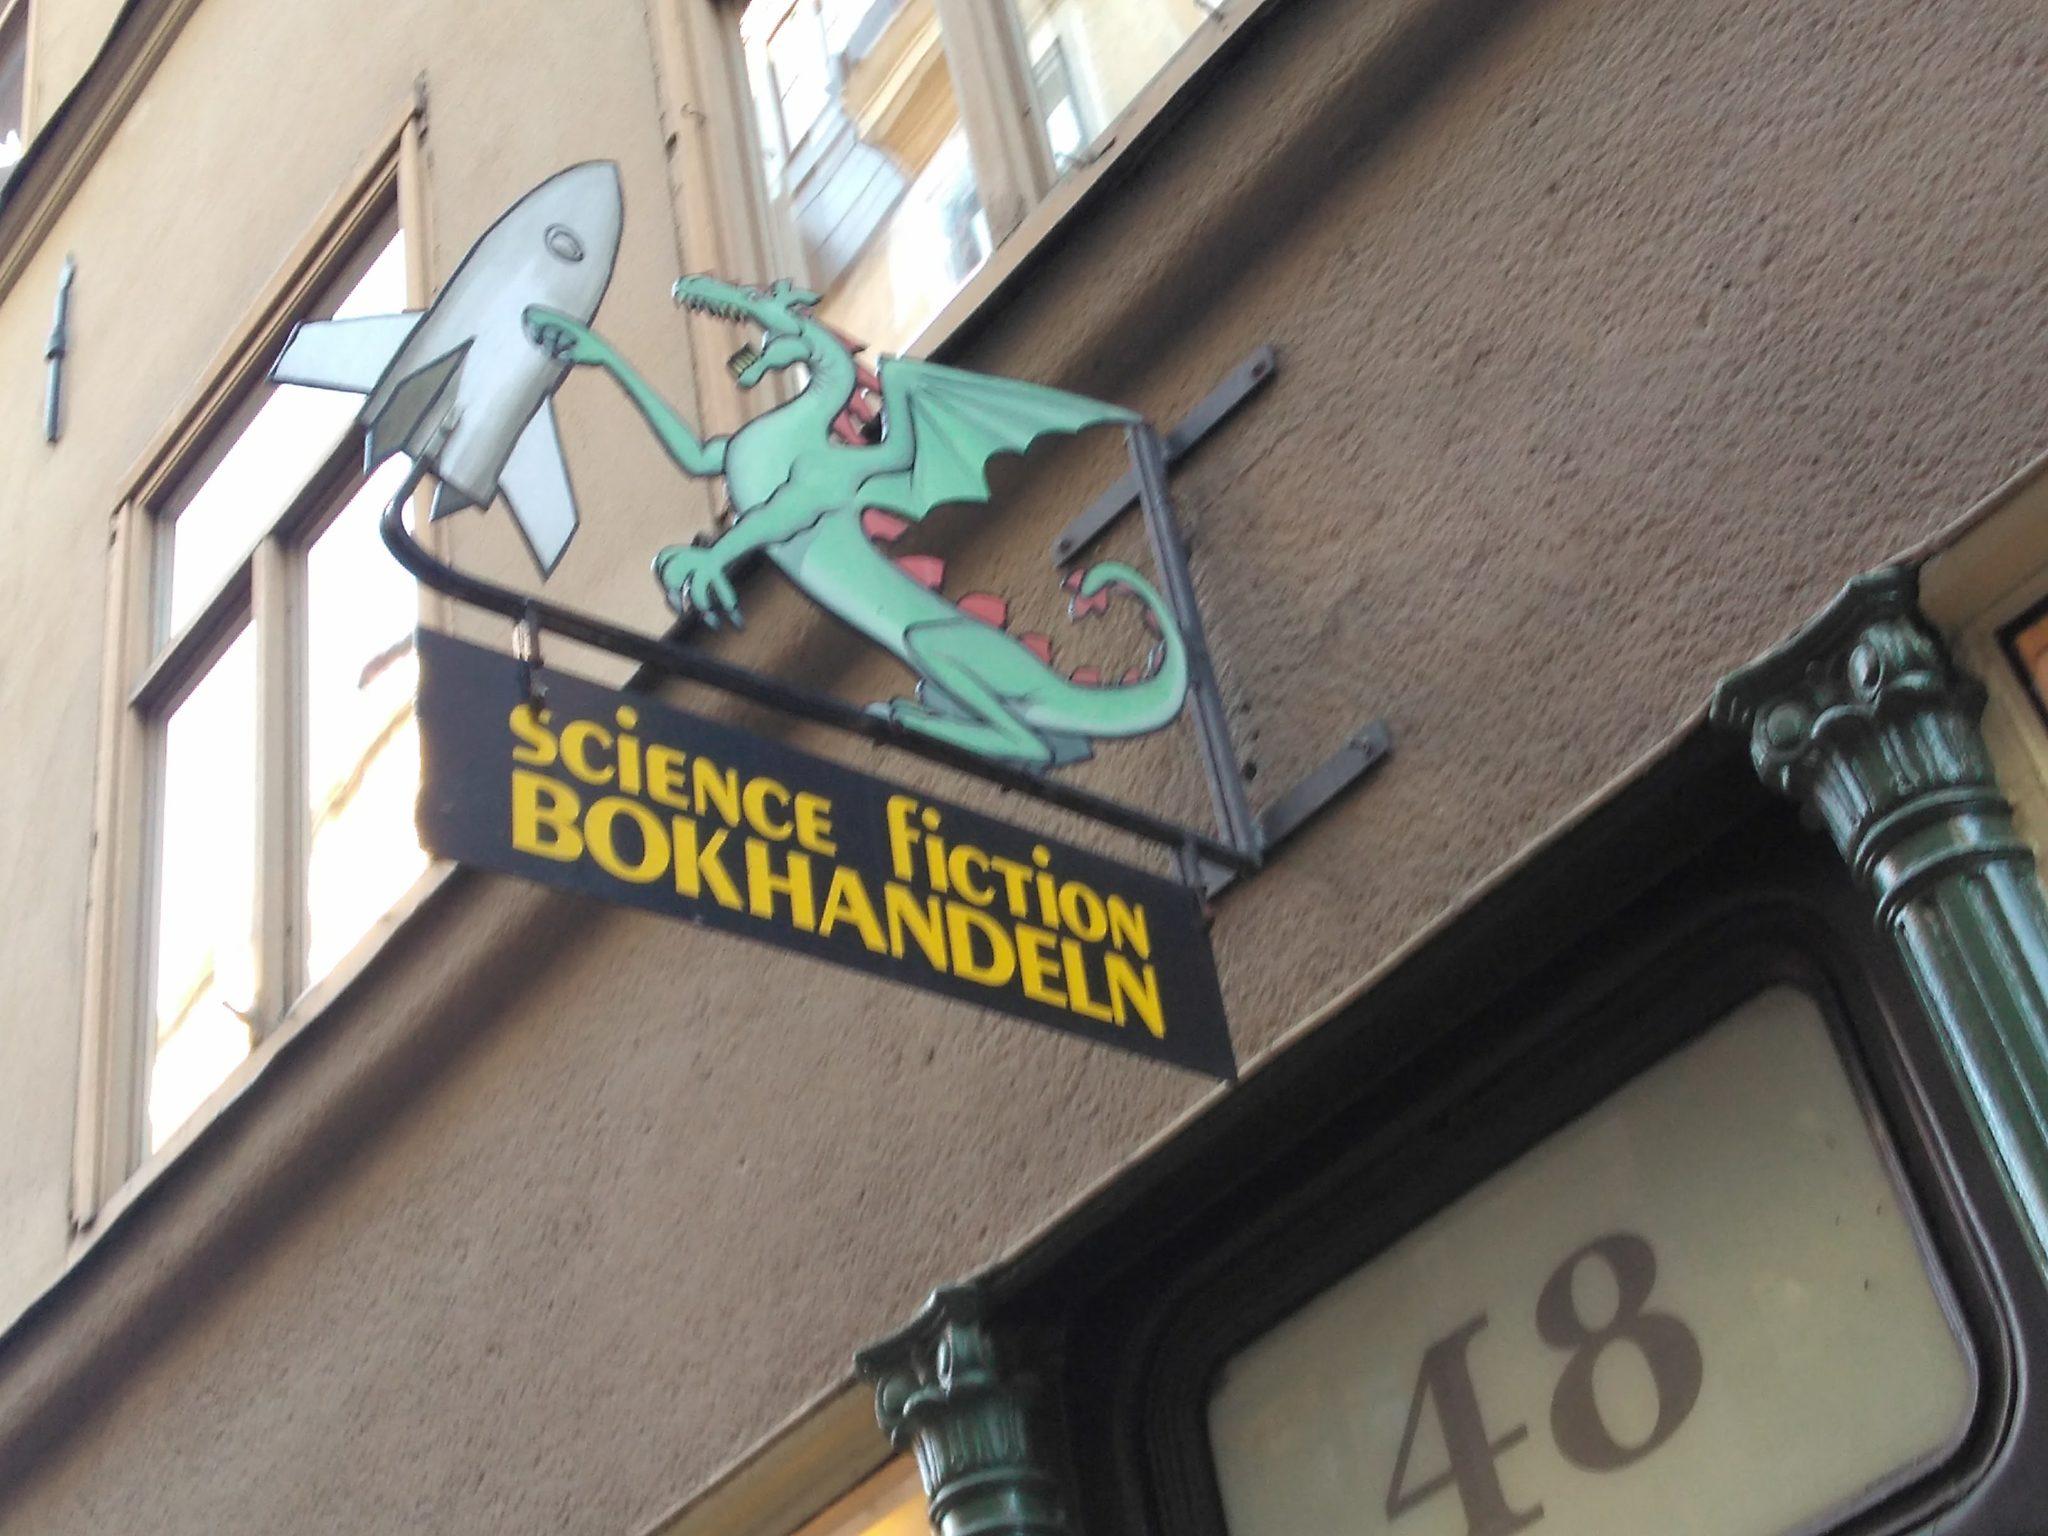 Libroaventuro en Stokholmo 1